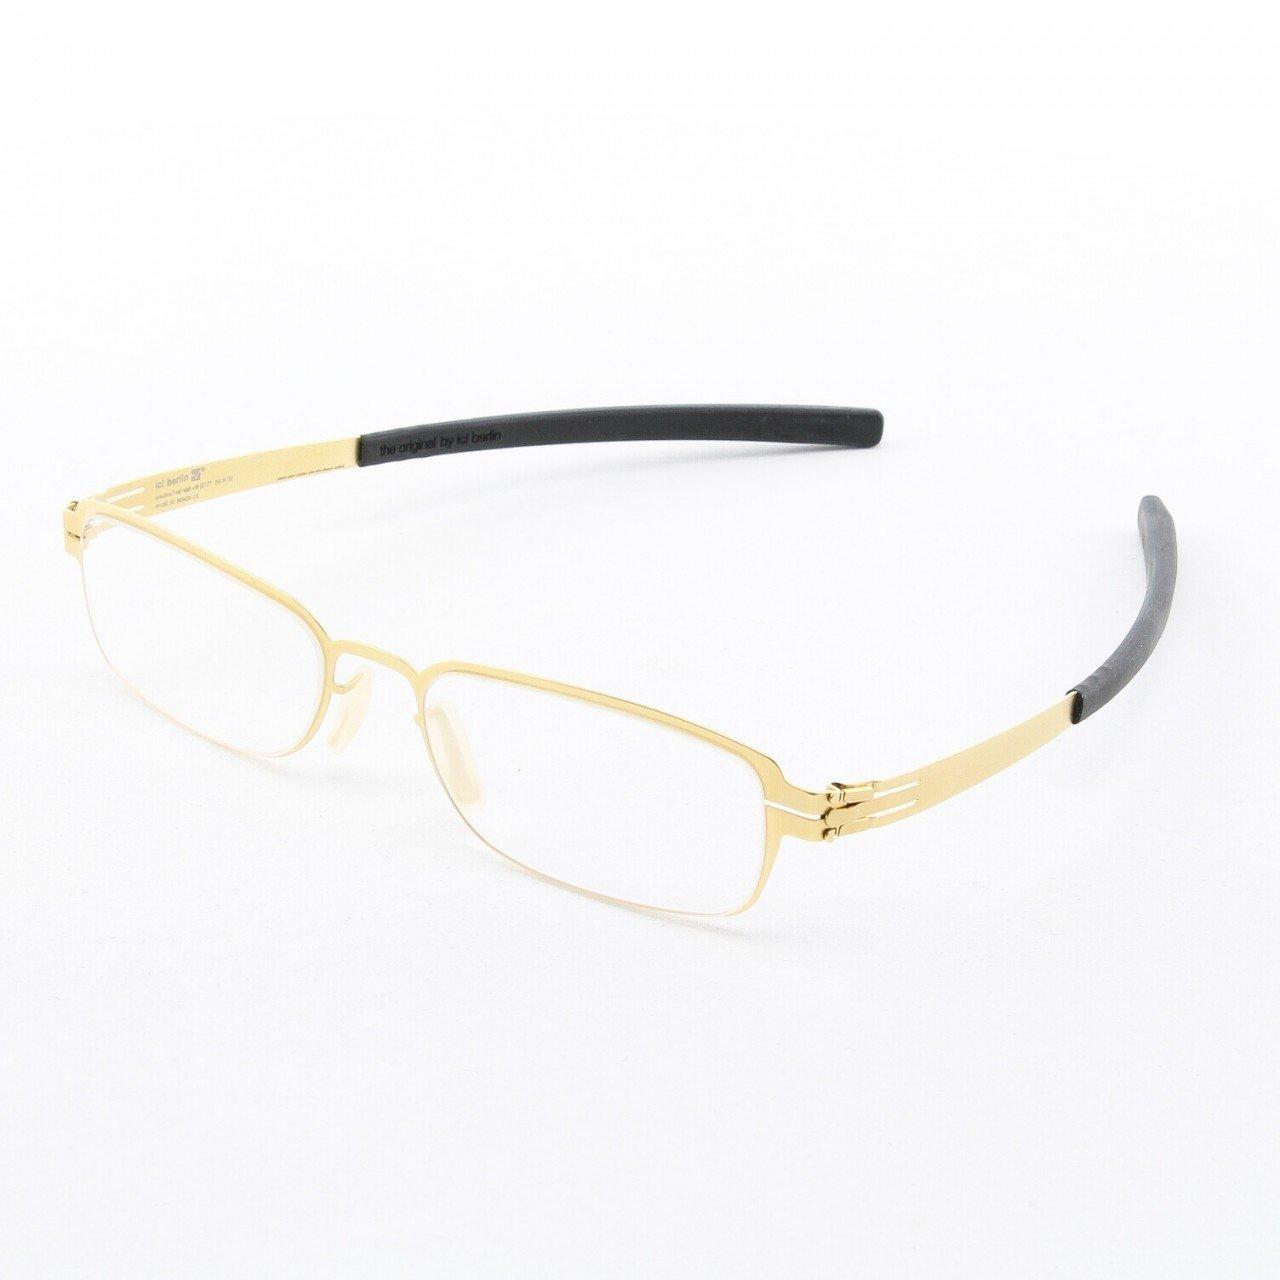 ic! Berlin Ilya K. Eyeglasses Col. Gold with Clear Lenses